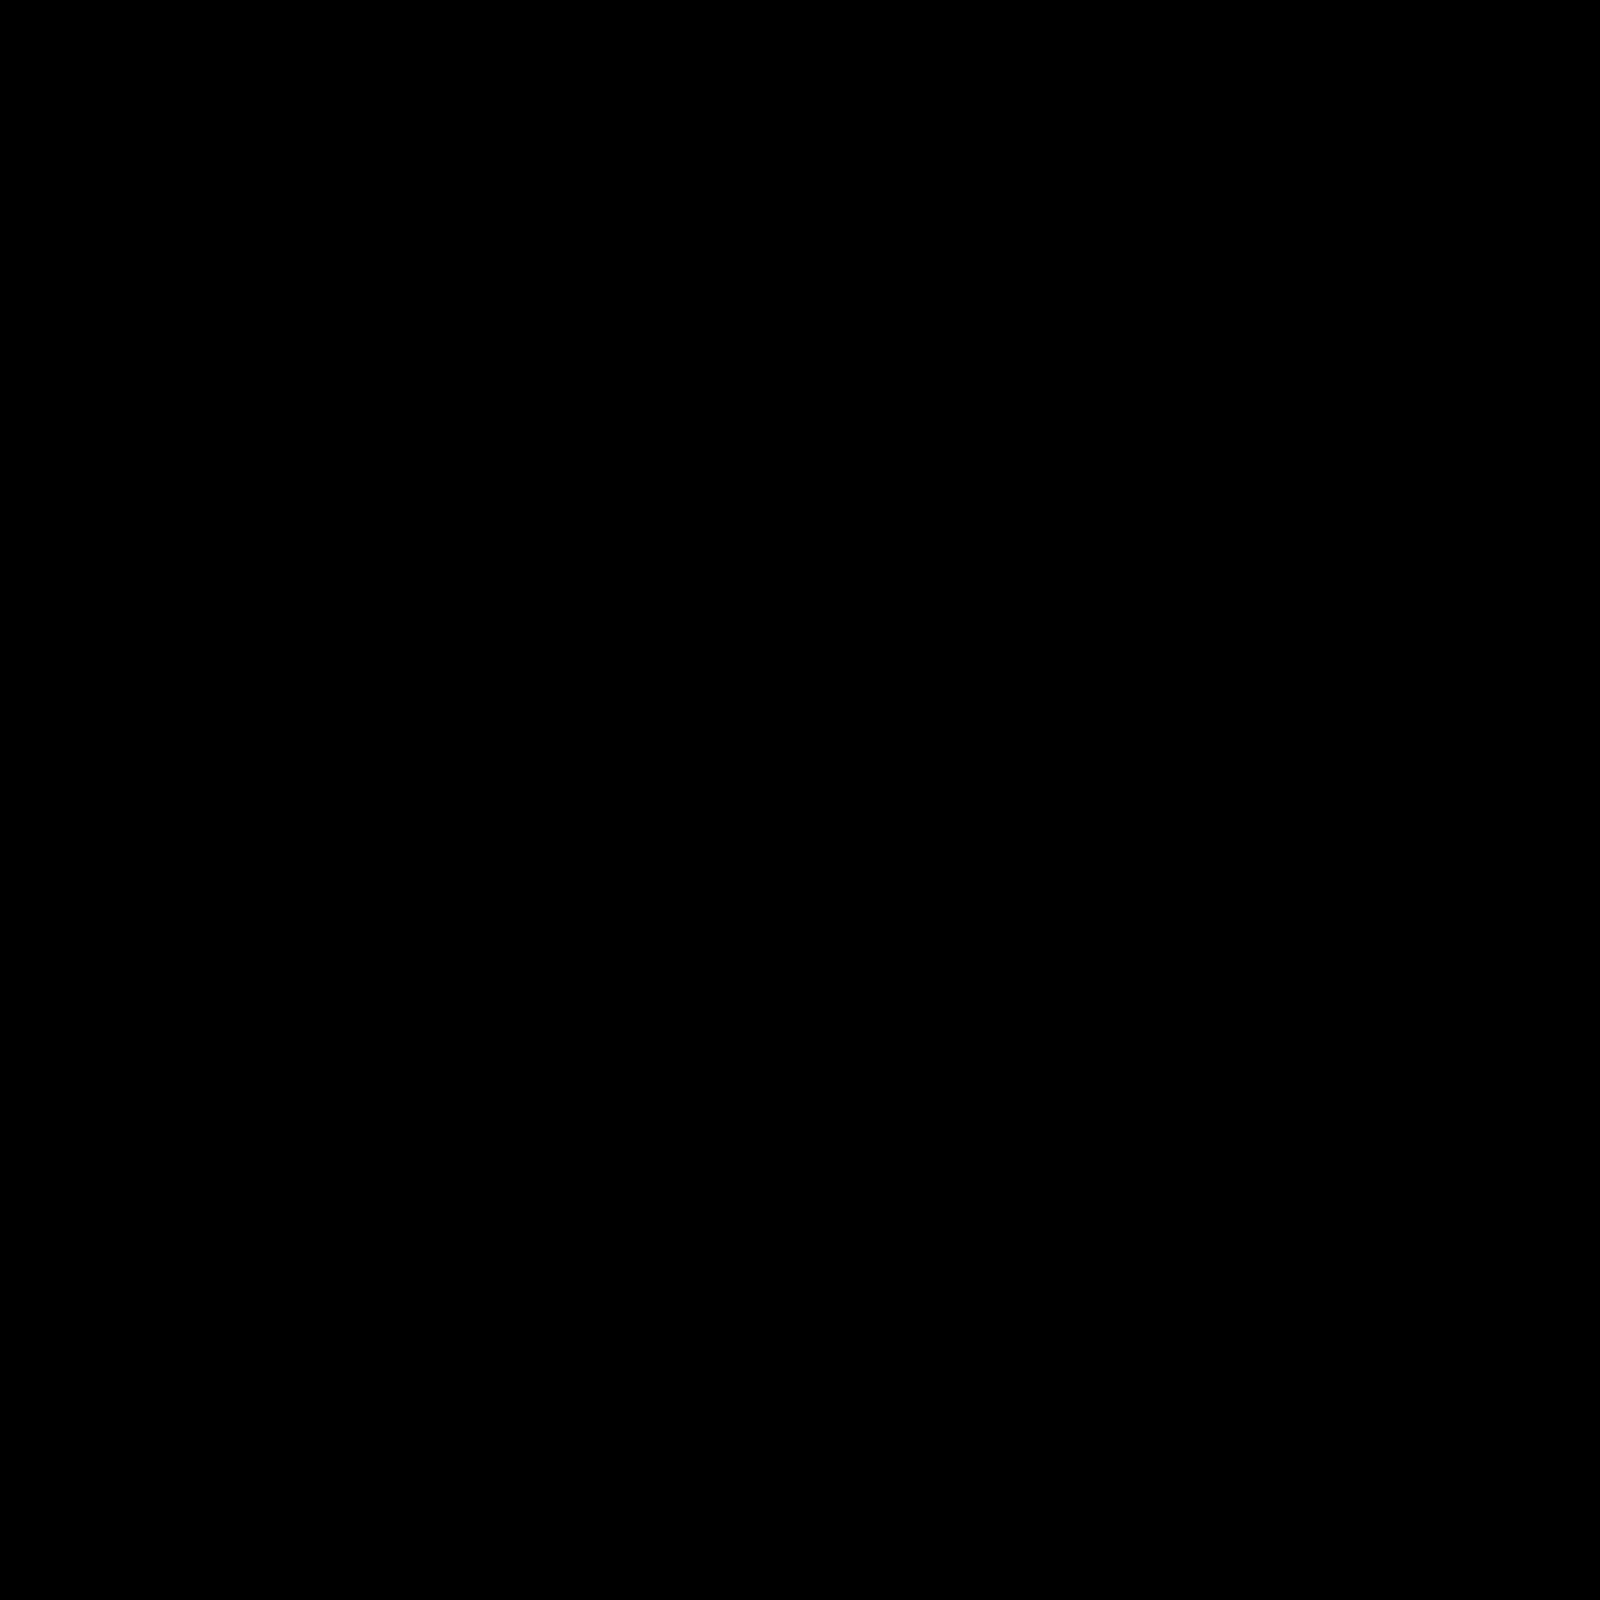 Больничная папка icon